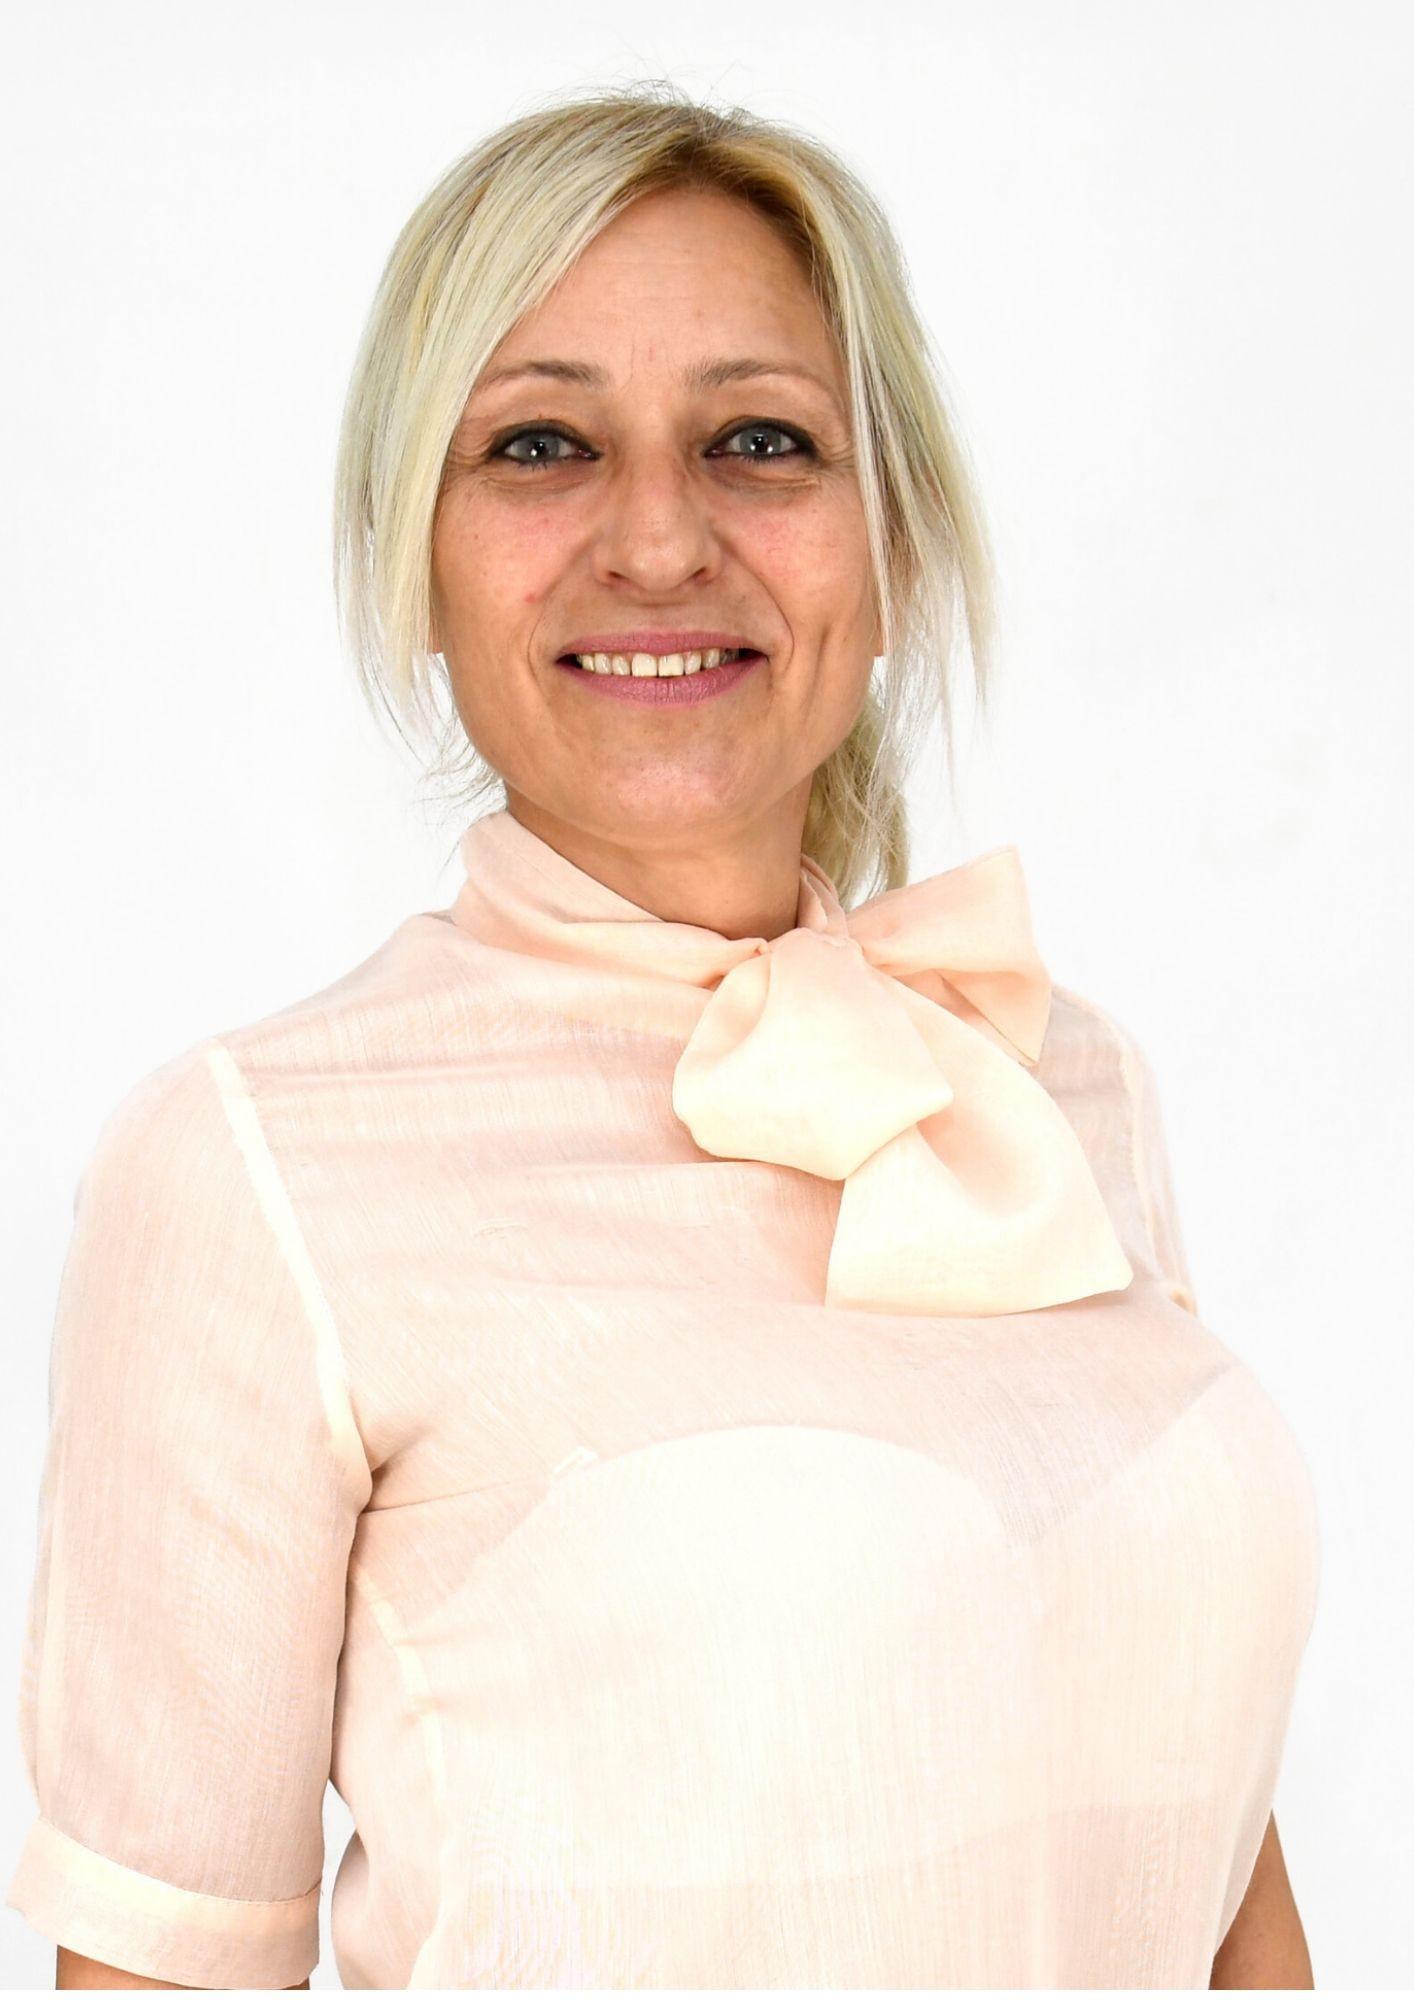 Marieta Ivanova Marinova